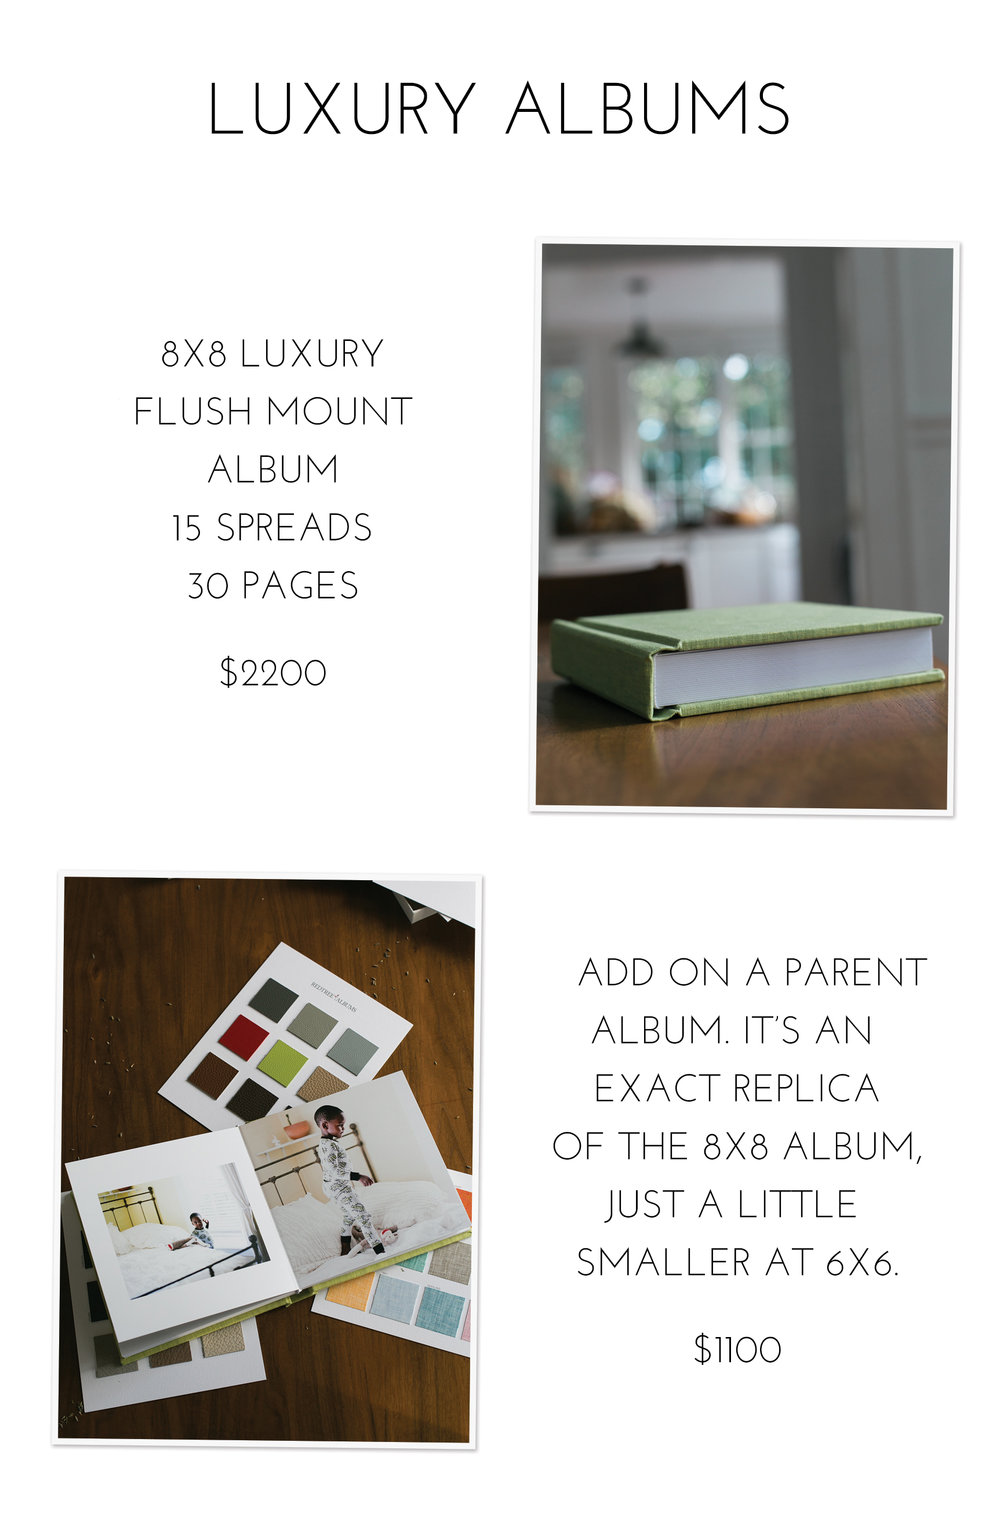 family luxury albums.jpg